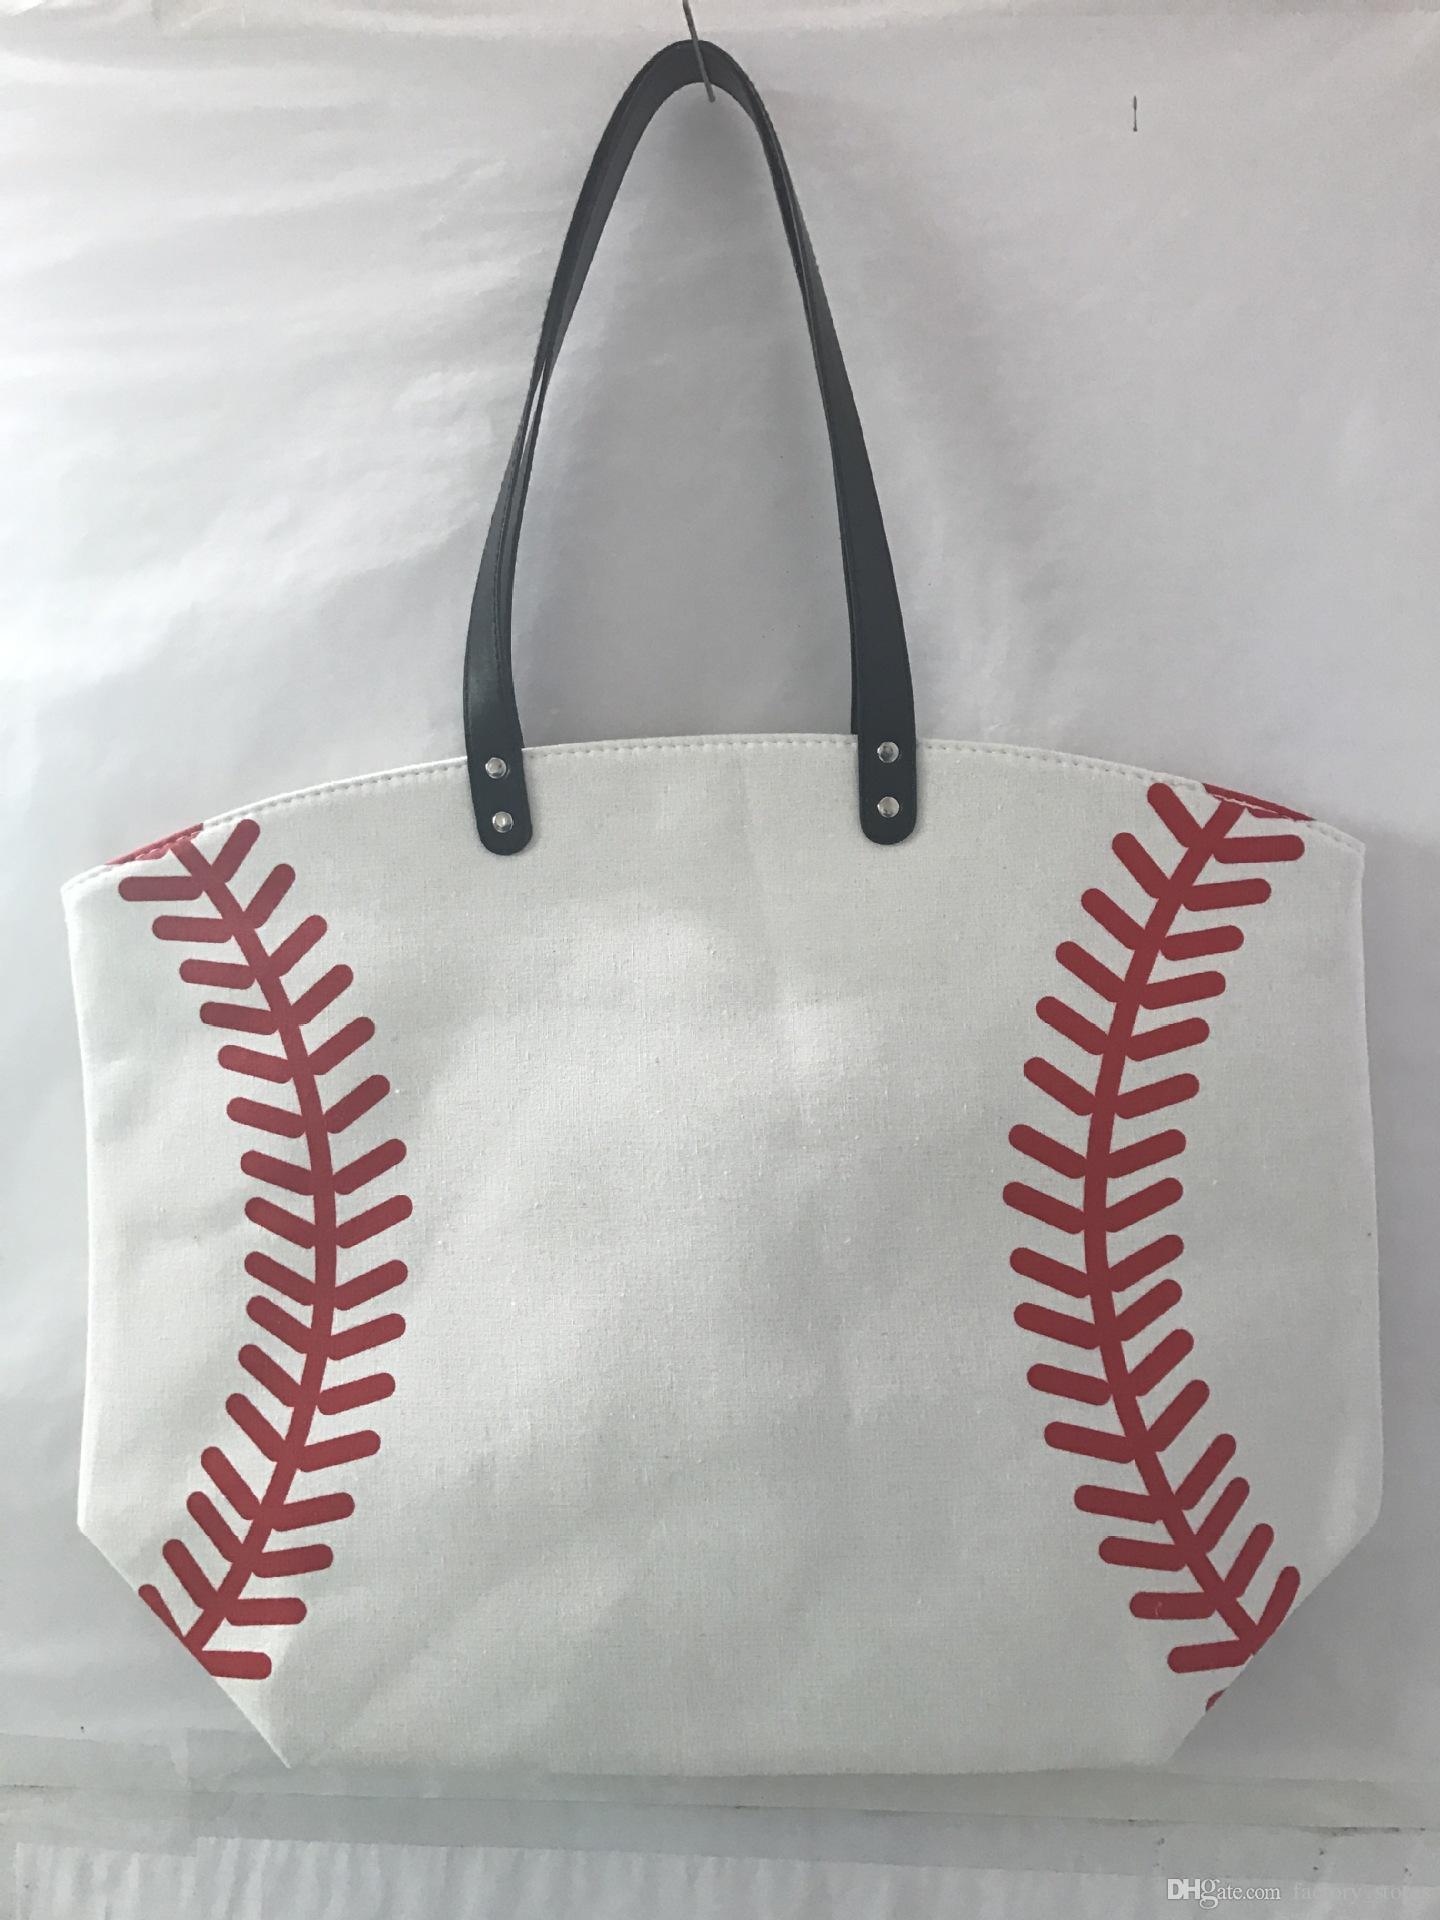 Borsa a tracolla sportiva di tela portatile Tote Basketball Baseball Softball Soccer Print Casual Borsa a mano di grande capacità Beach Hand Bags A22803